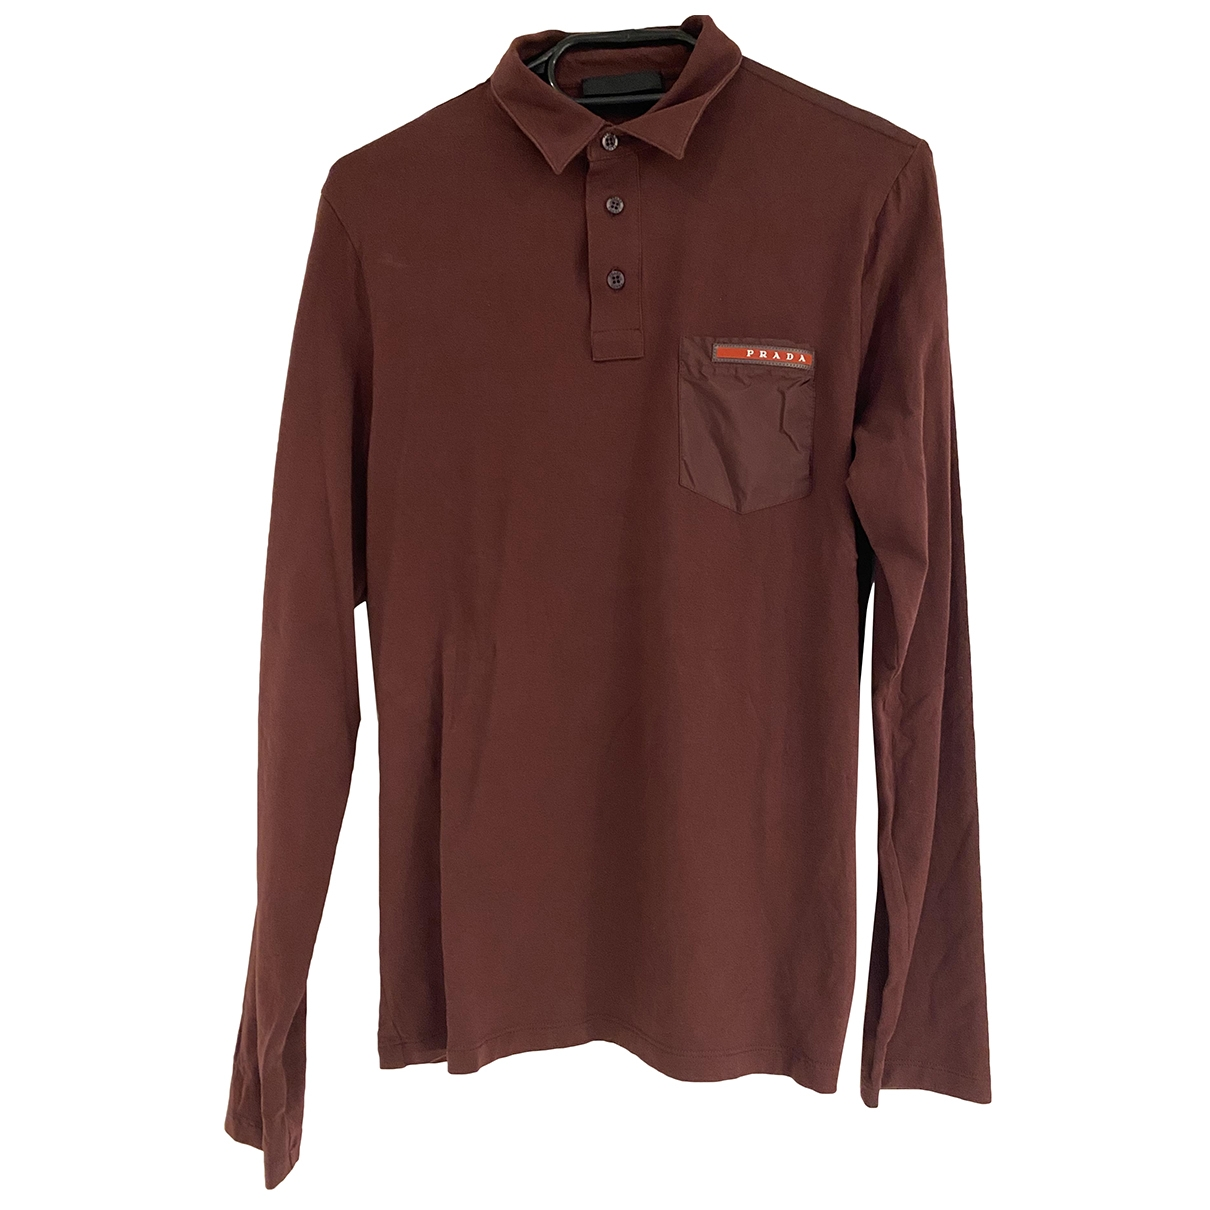 Prada \N Burgundy Cotton Polo shirts for Men S International